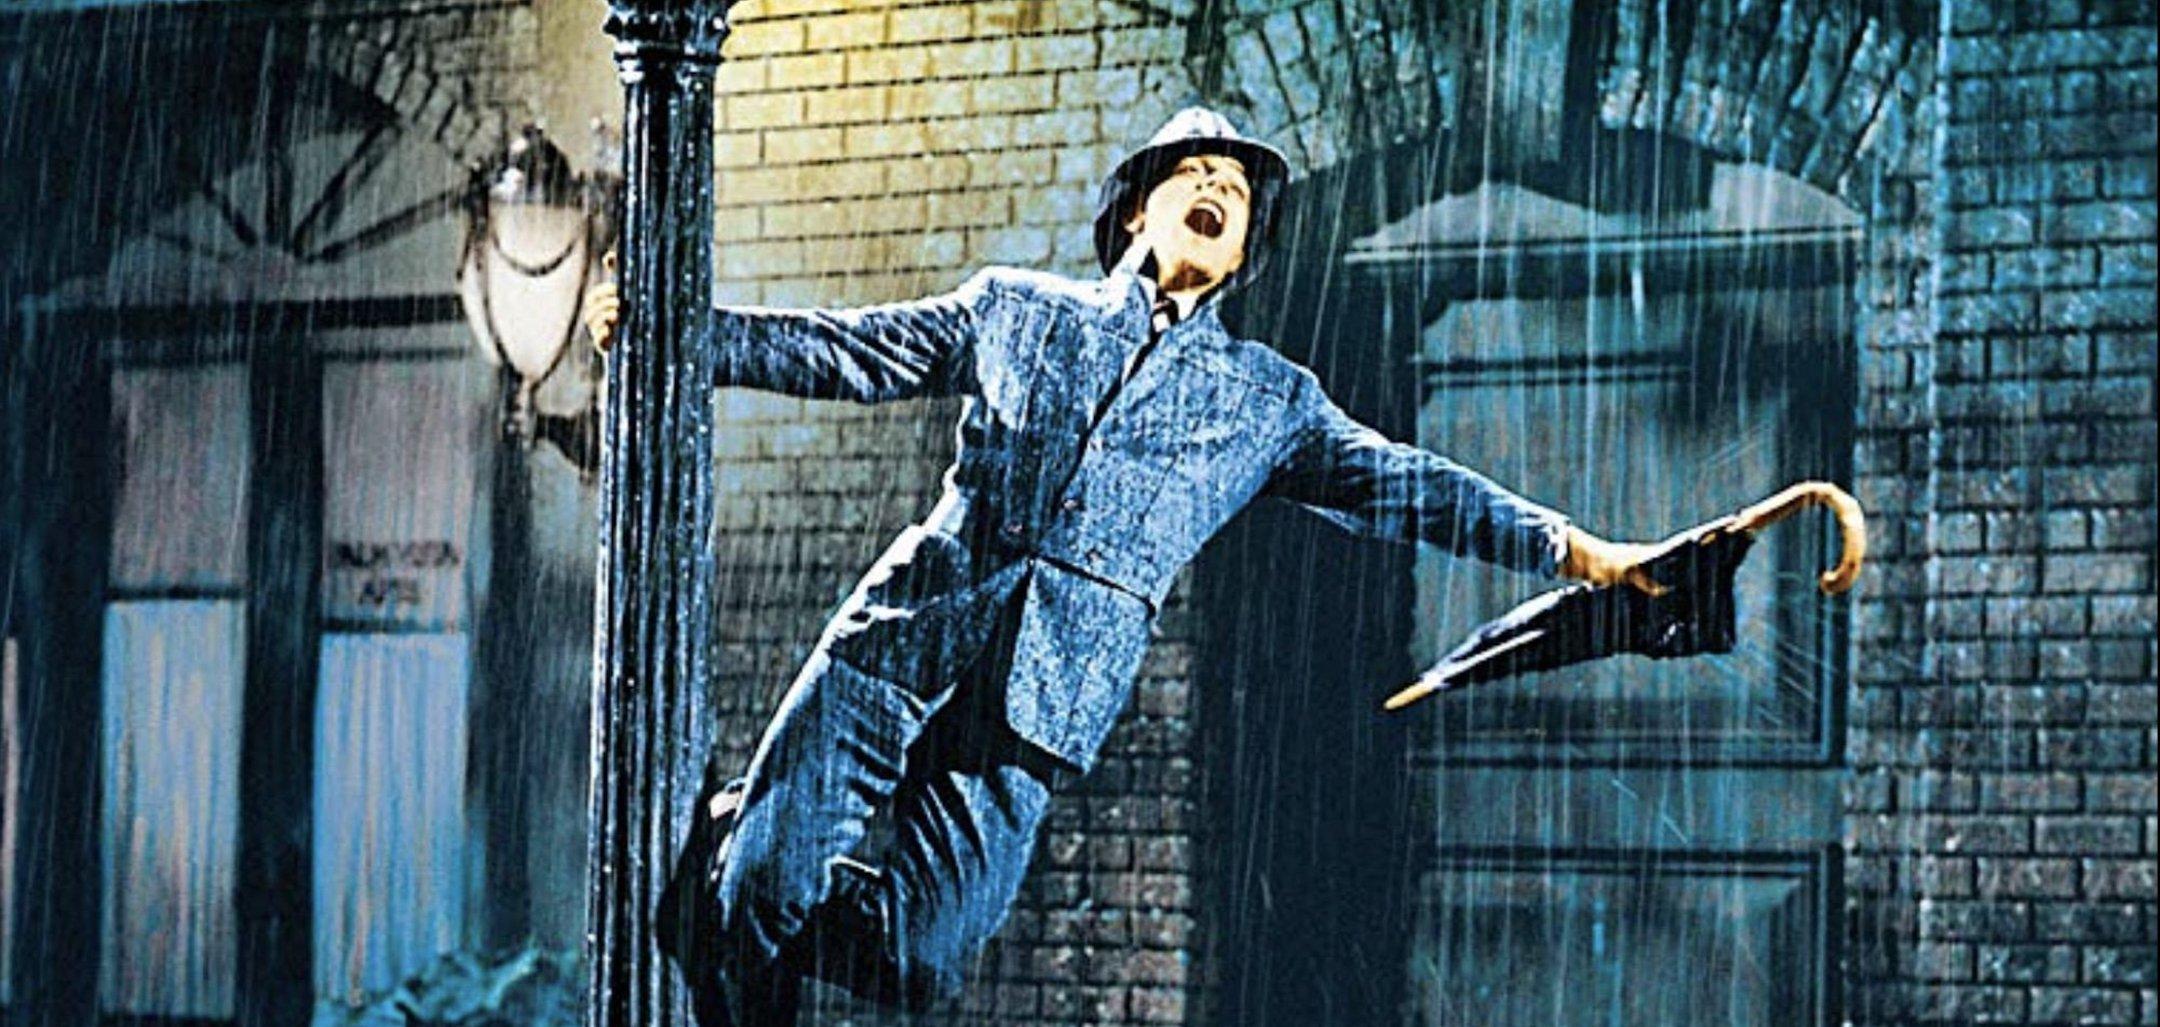 Singin' in the Rain - hero image